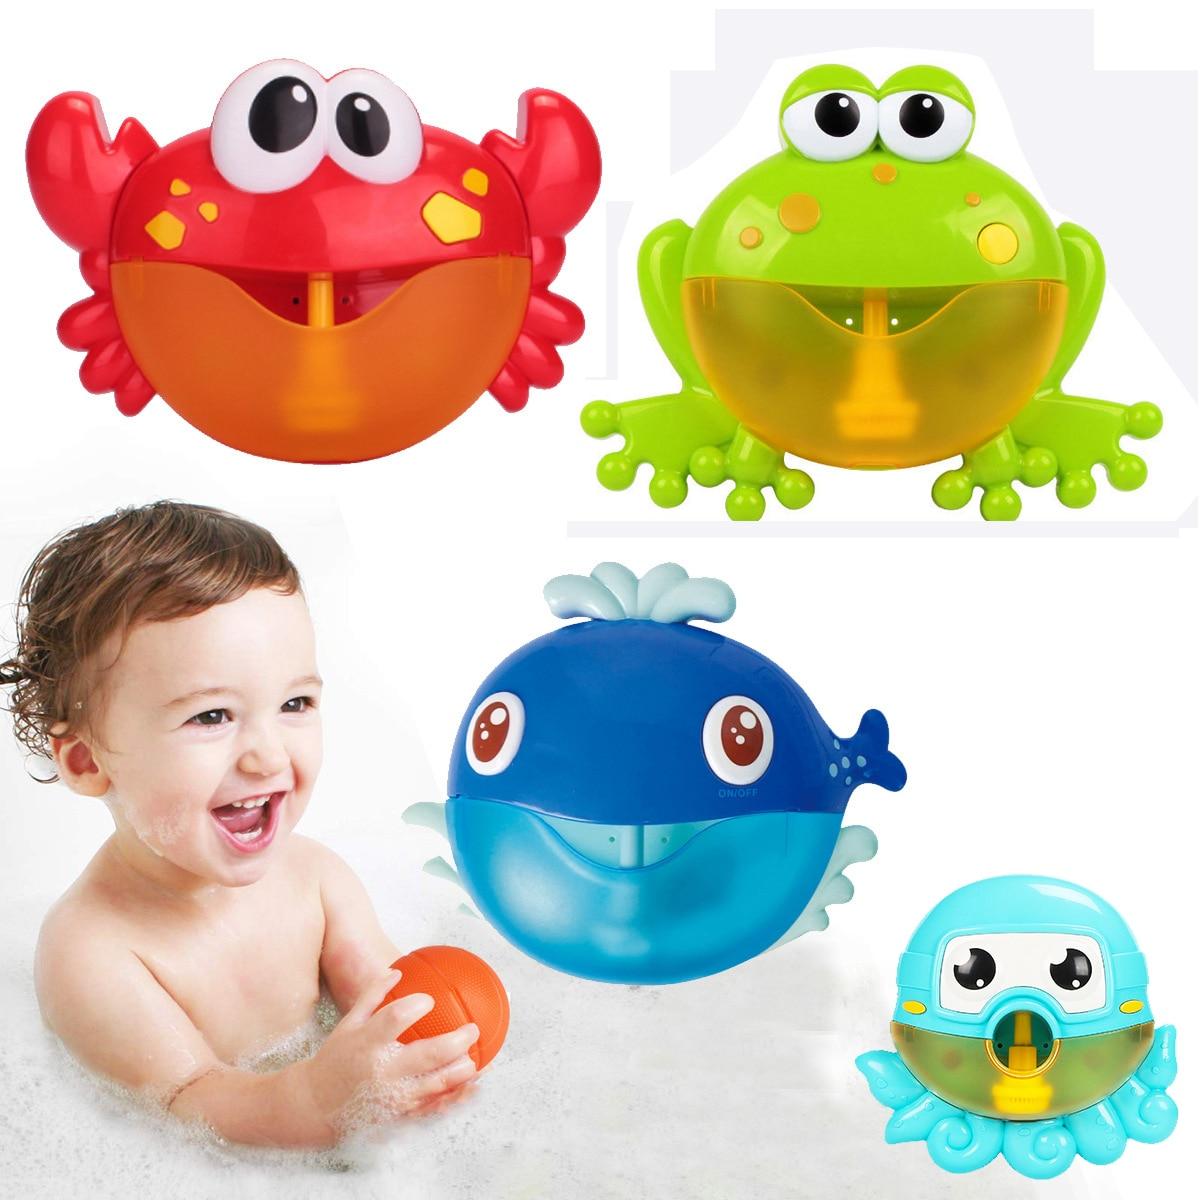 Dropshipping máquina de burbujas cangrejo Rana música niños baño juguete bañera jabón automático burbuja fabricante bebé baño juguete para niños